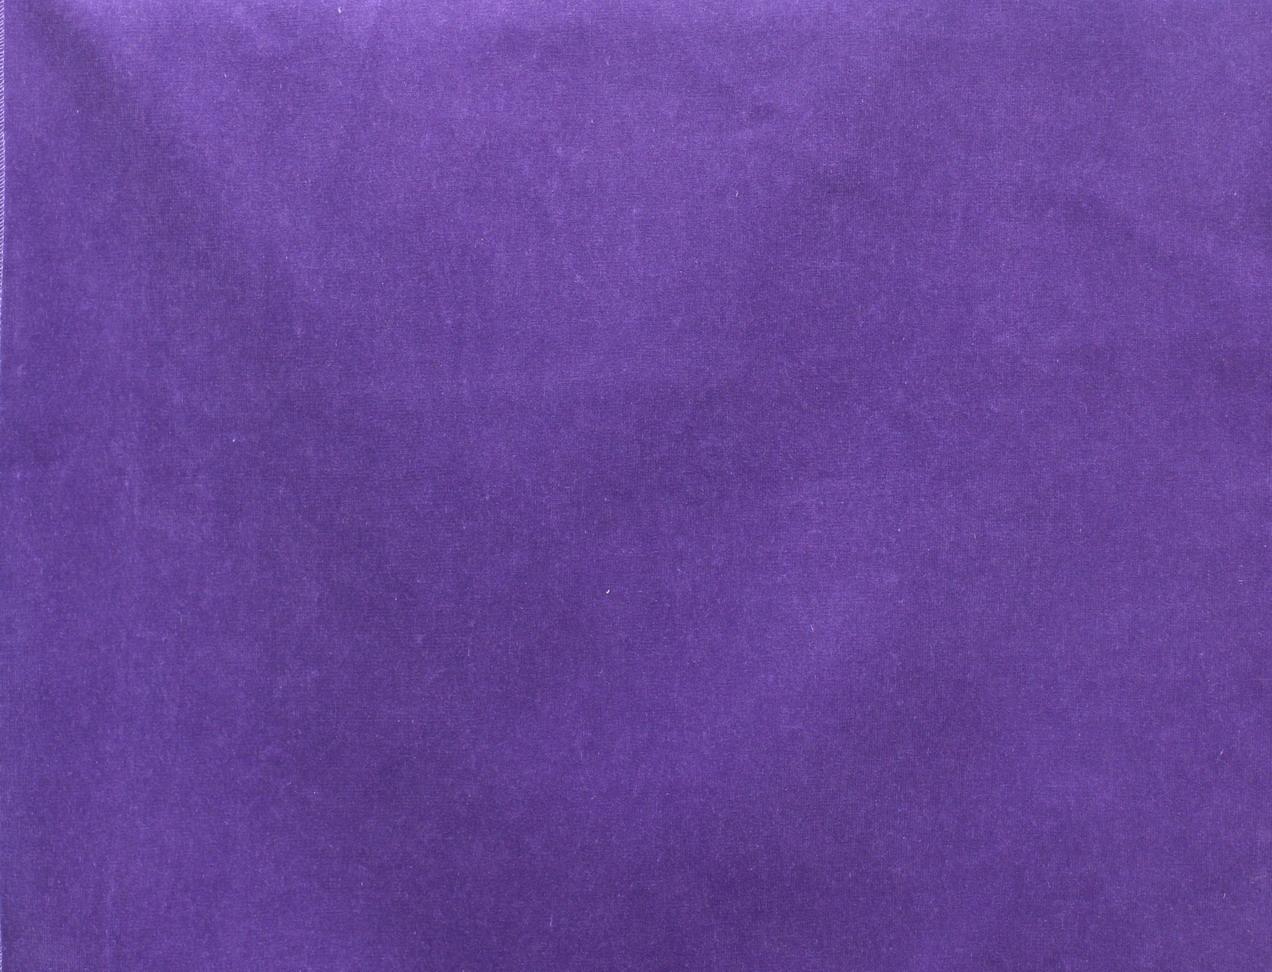 LIOCORNO Purple